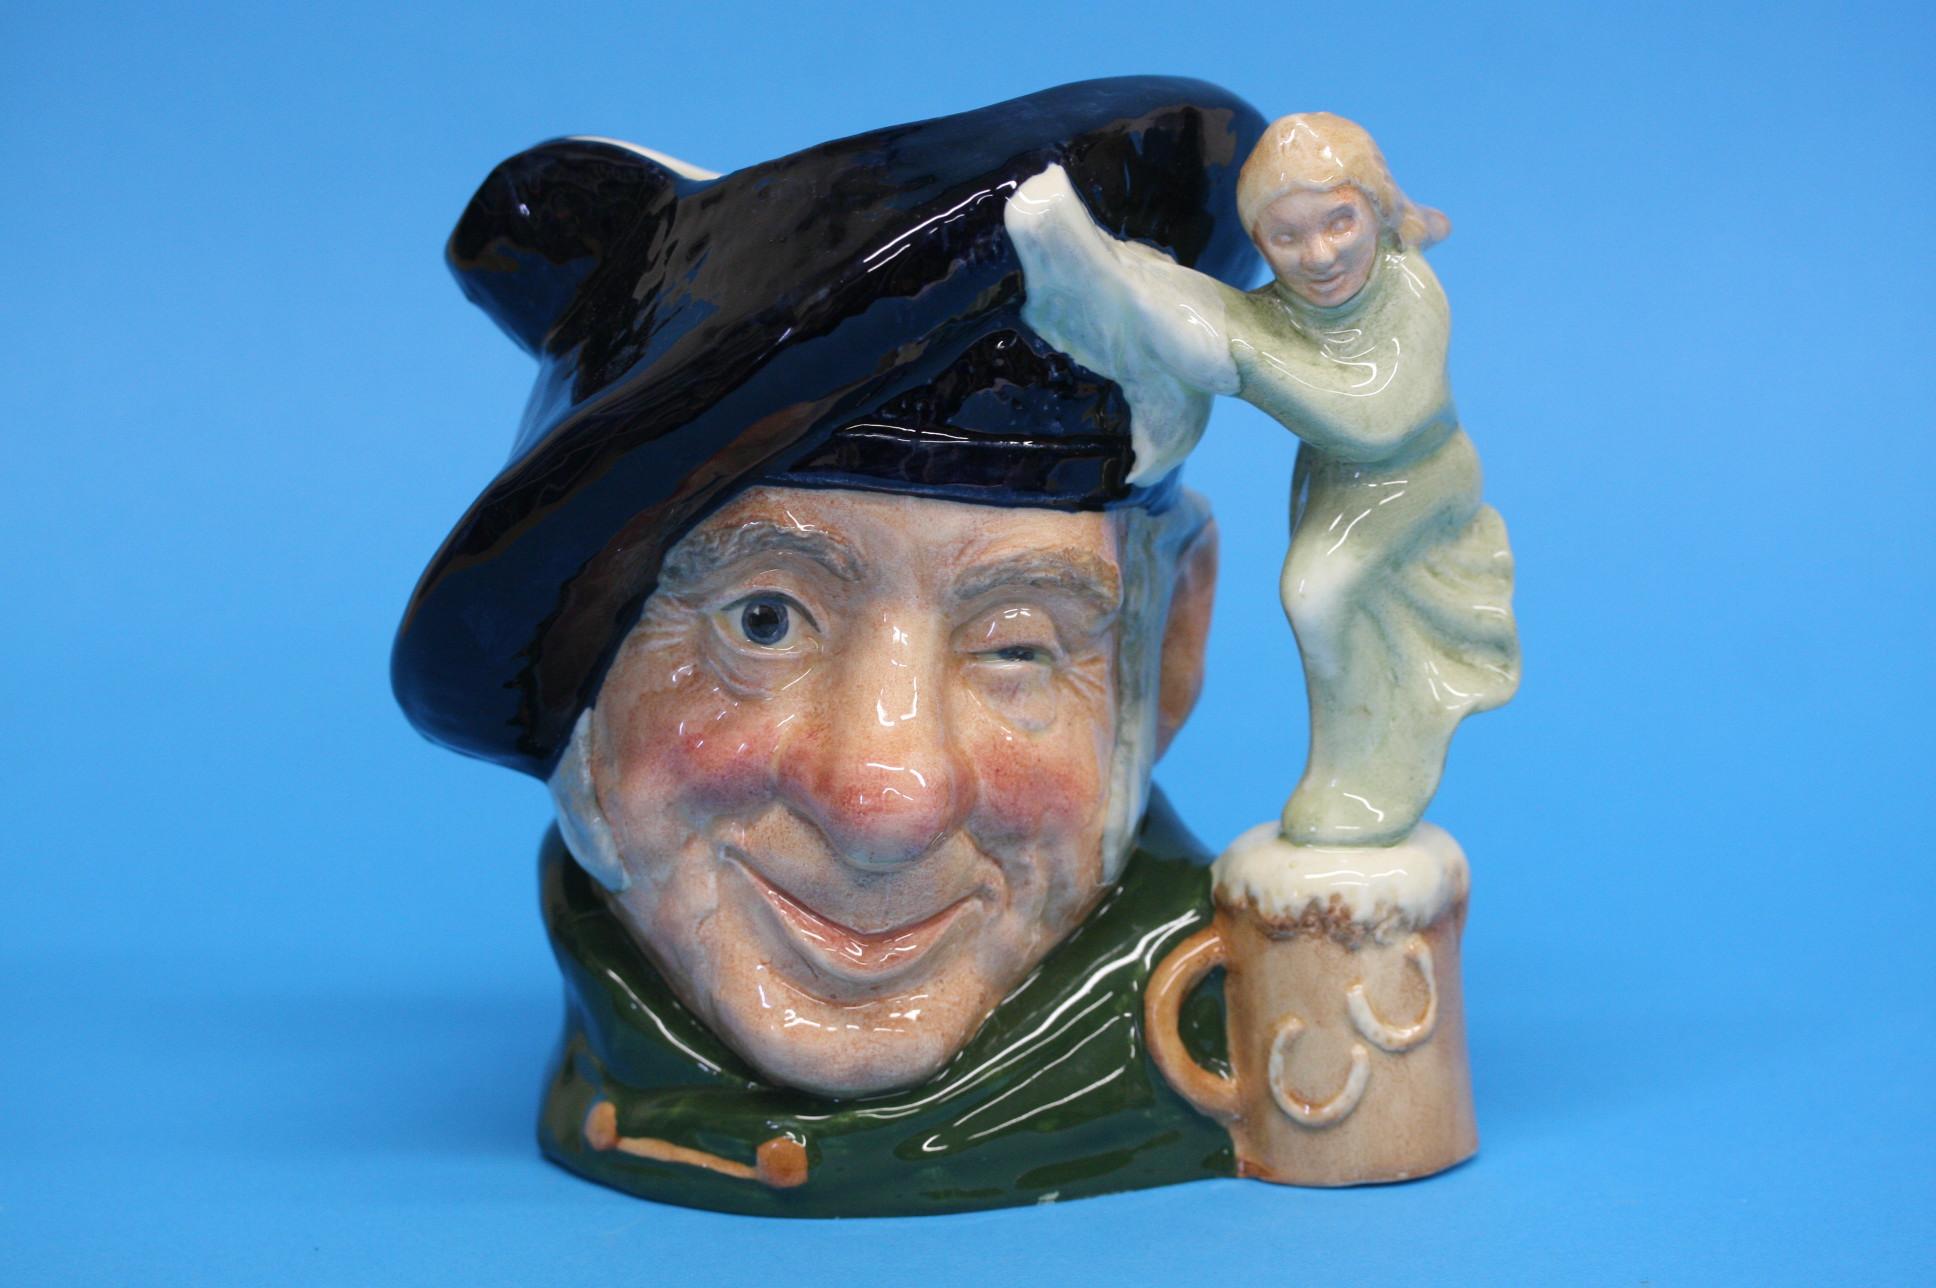 A Royal Doulton Character jug 'Dick Whittington' a - Image 2 of 3